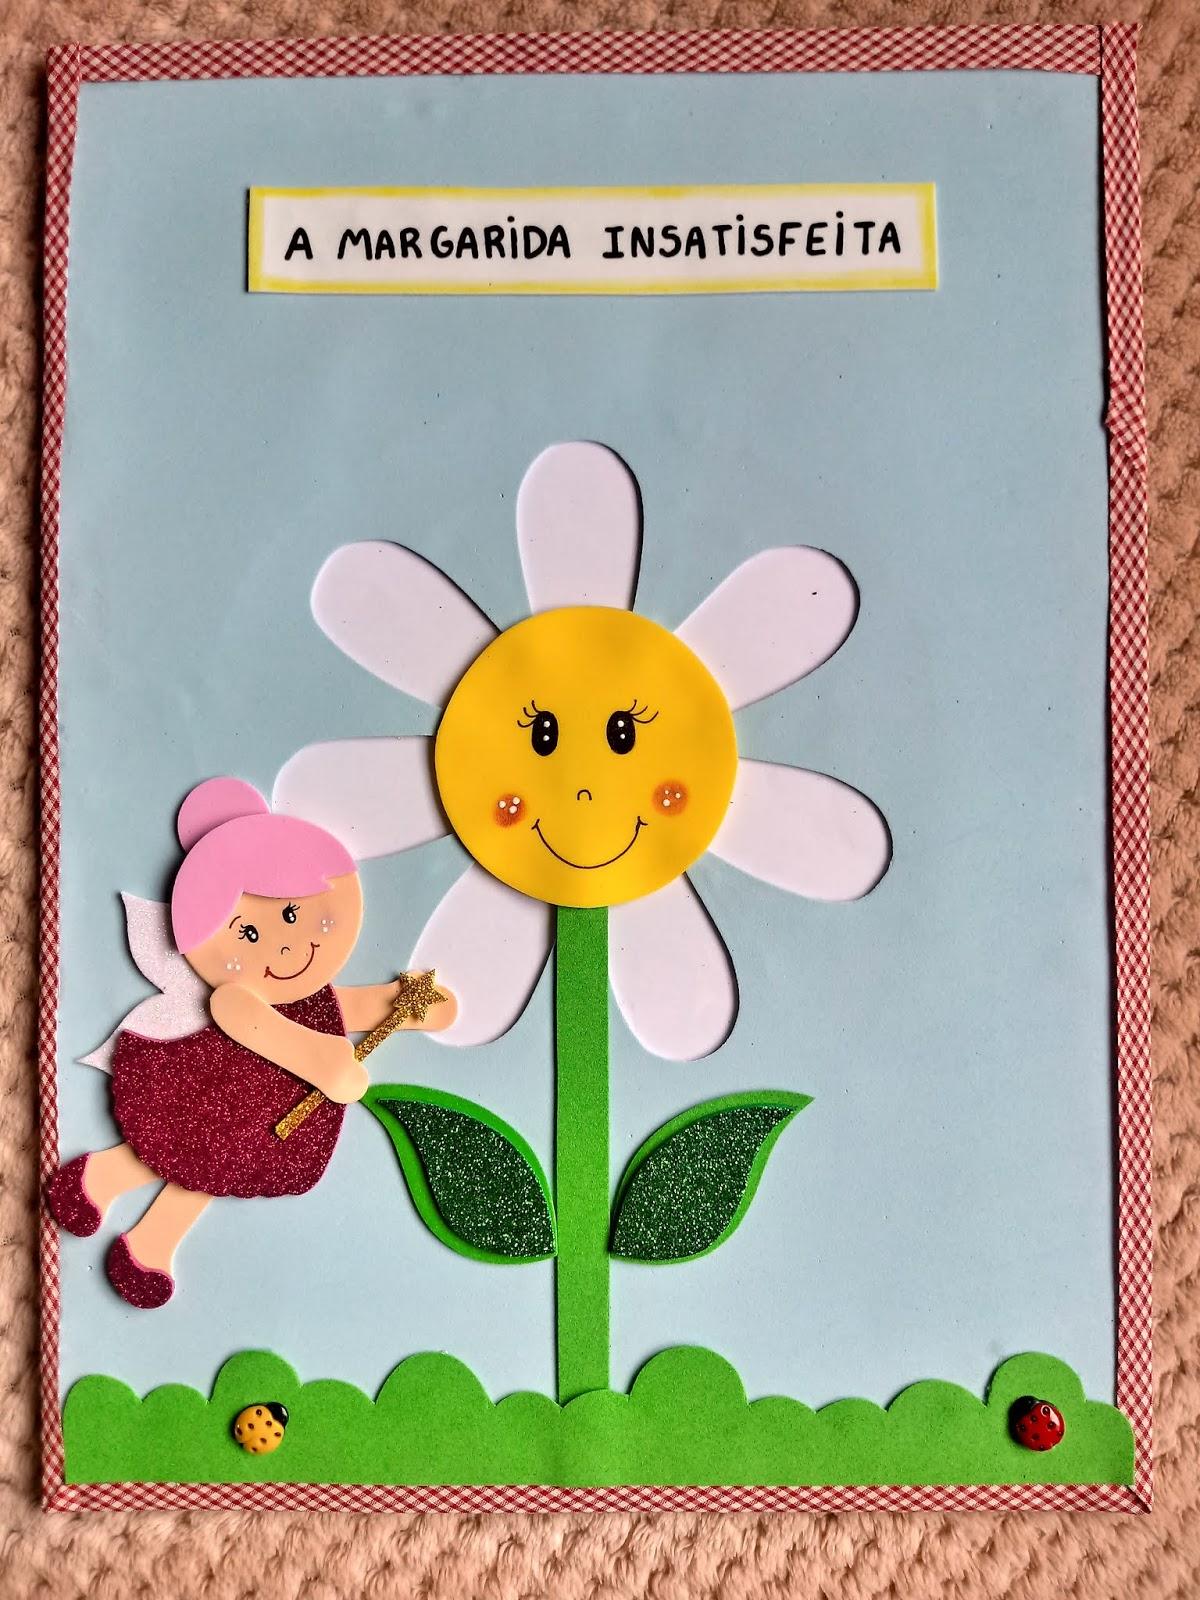 Aline Costa História No Envelope A Margarida Insatisfeita